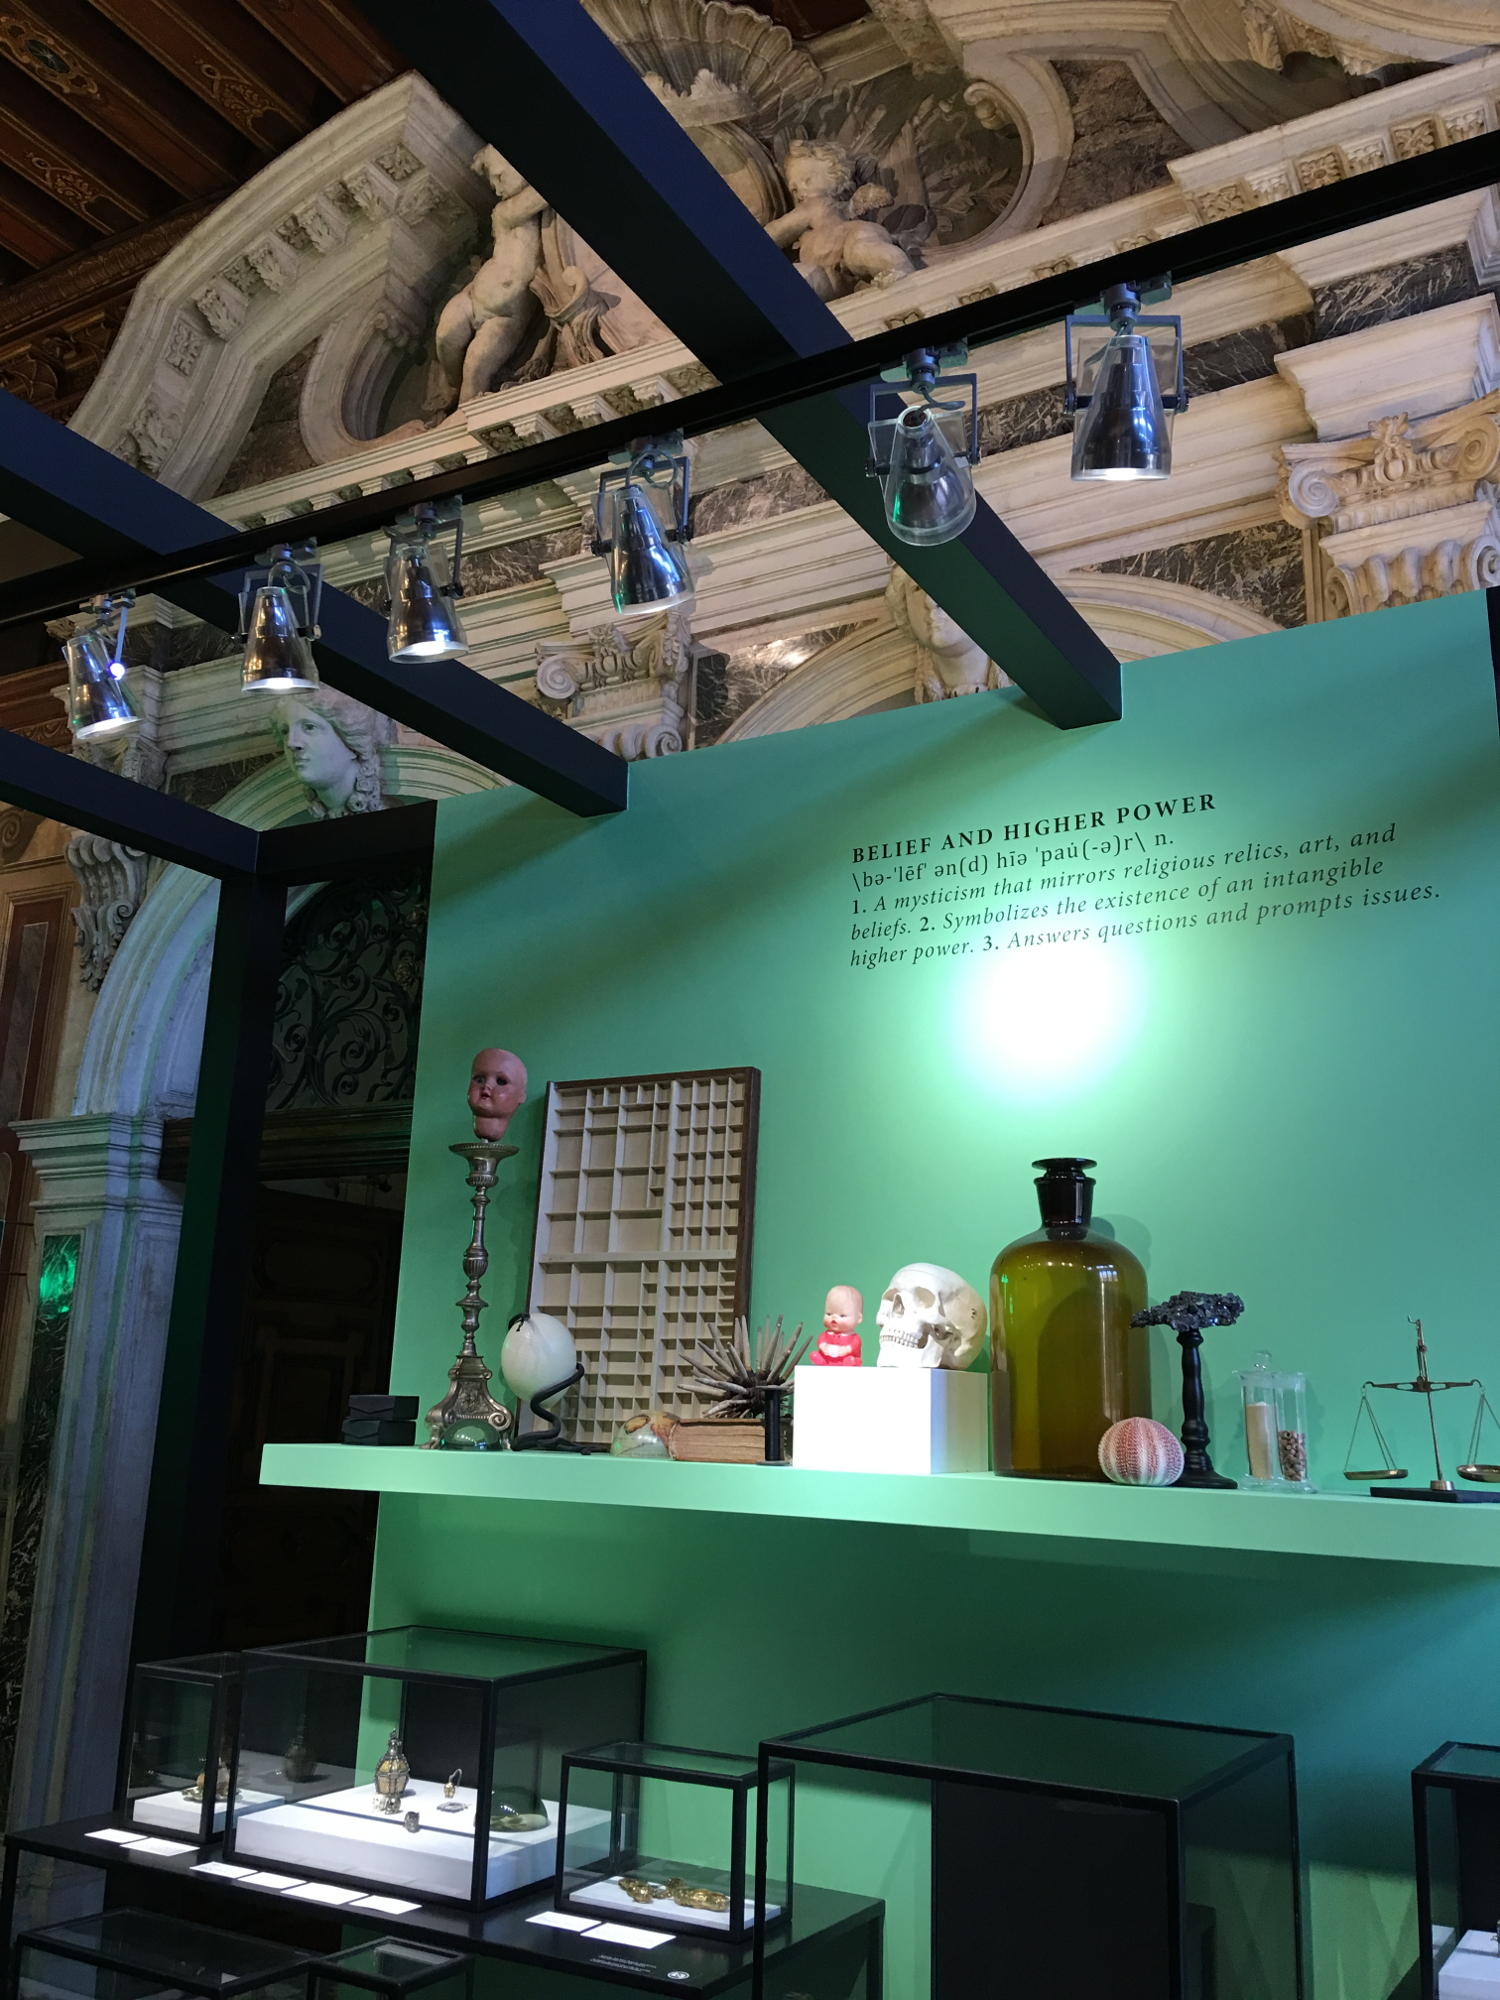 rocaille-blog-venezia-palazzo-mocenigo-cabinet-of-curiosities-collezione-storp-profumo-9